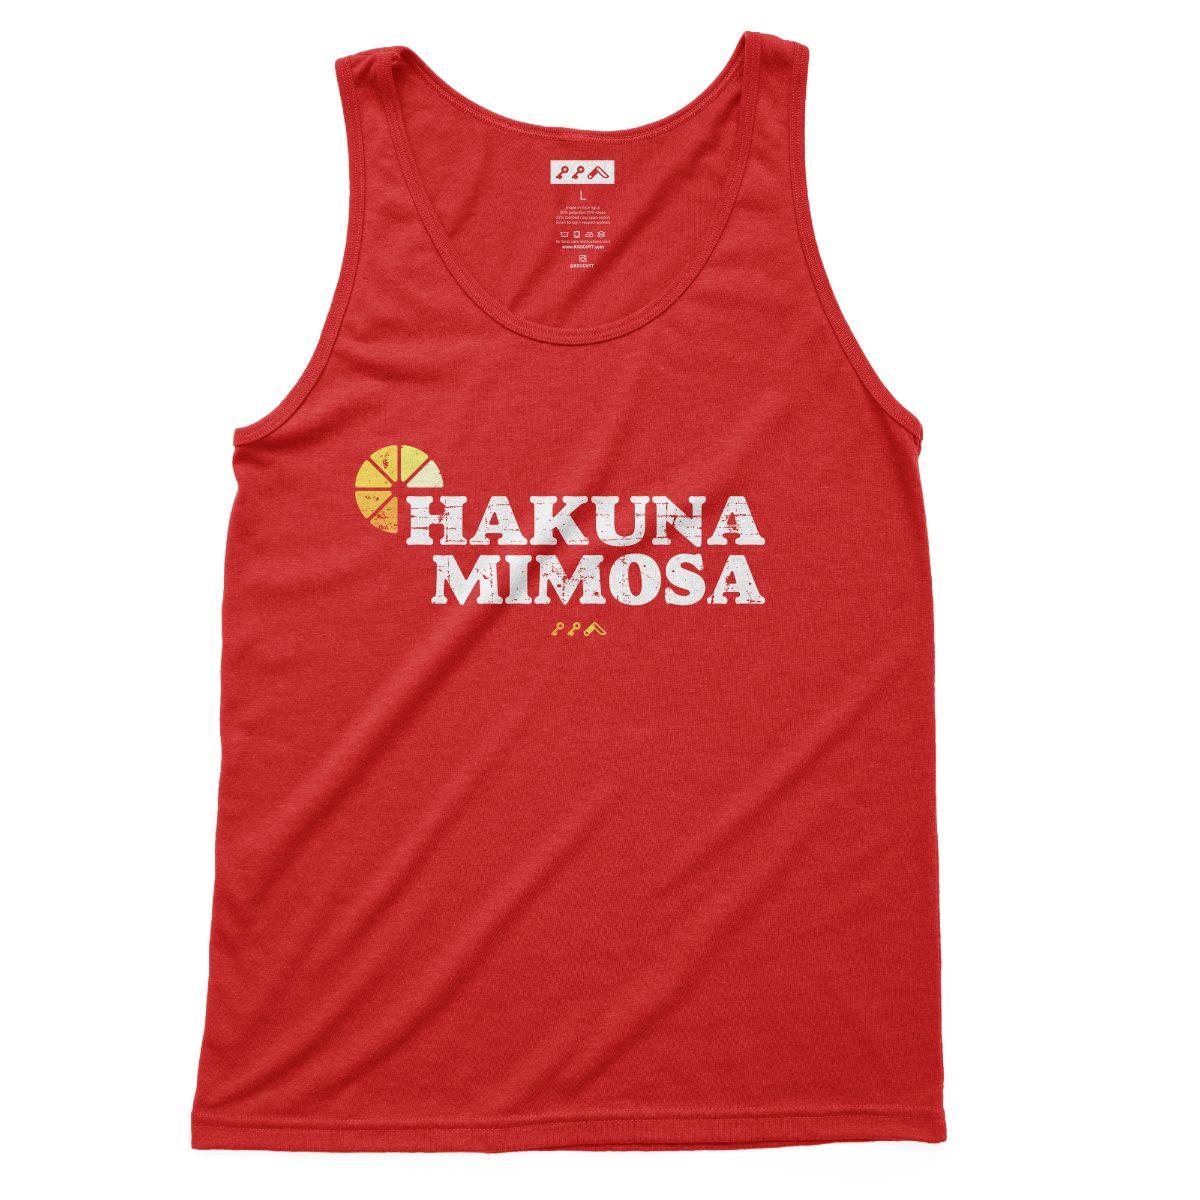 HAKUNA MIMOSA sunday funday drinking tank tops in red at kikicutt.com